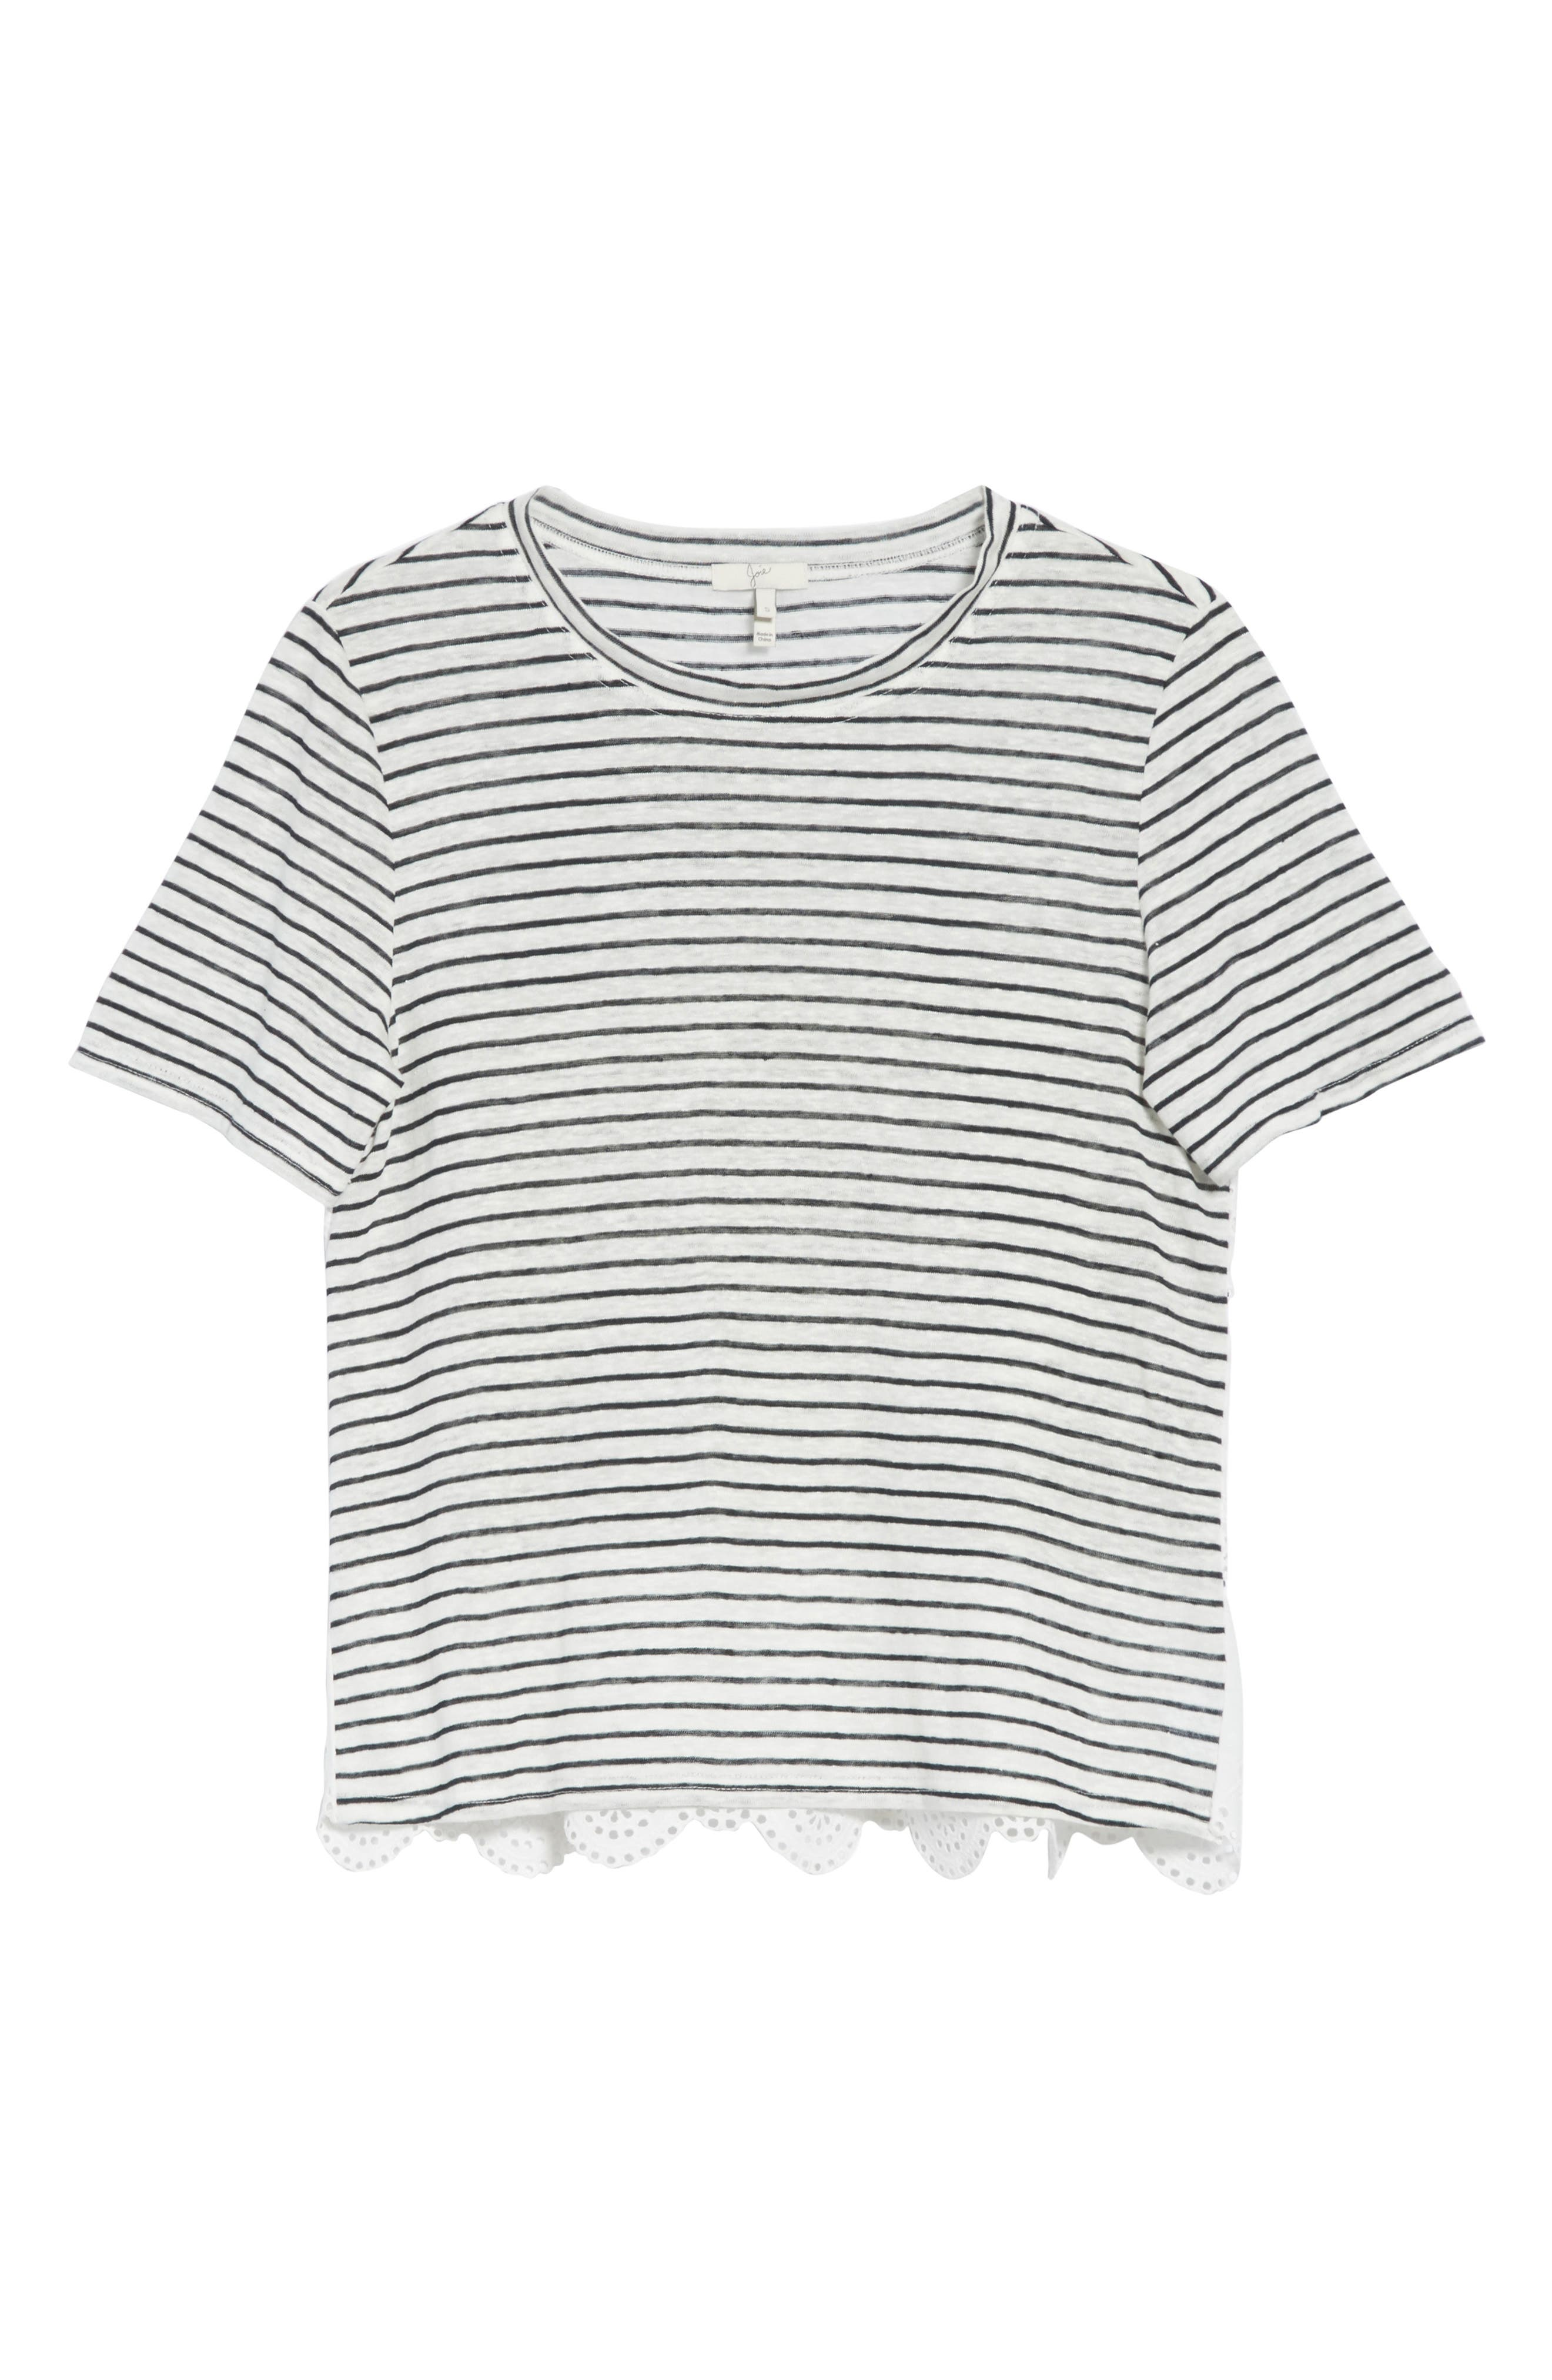 Mikiyo Stripe Linen Tee,                             Alternate thumbnail 6, color,                             131